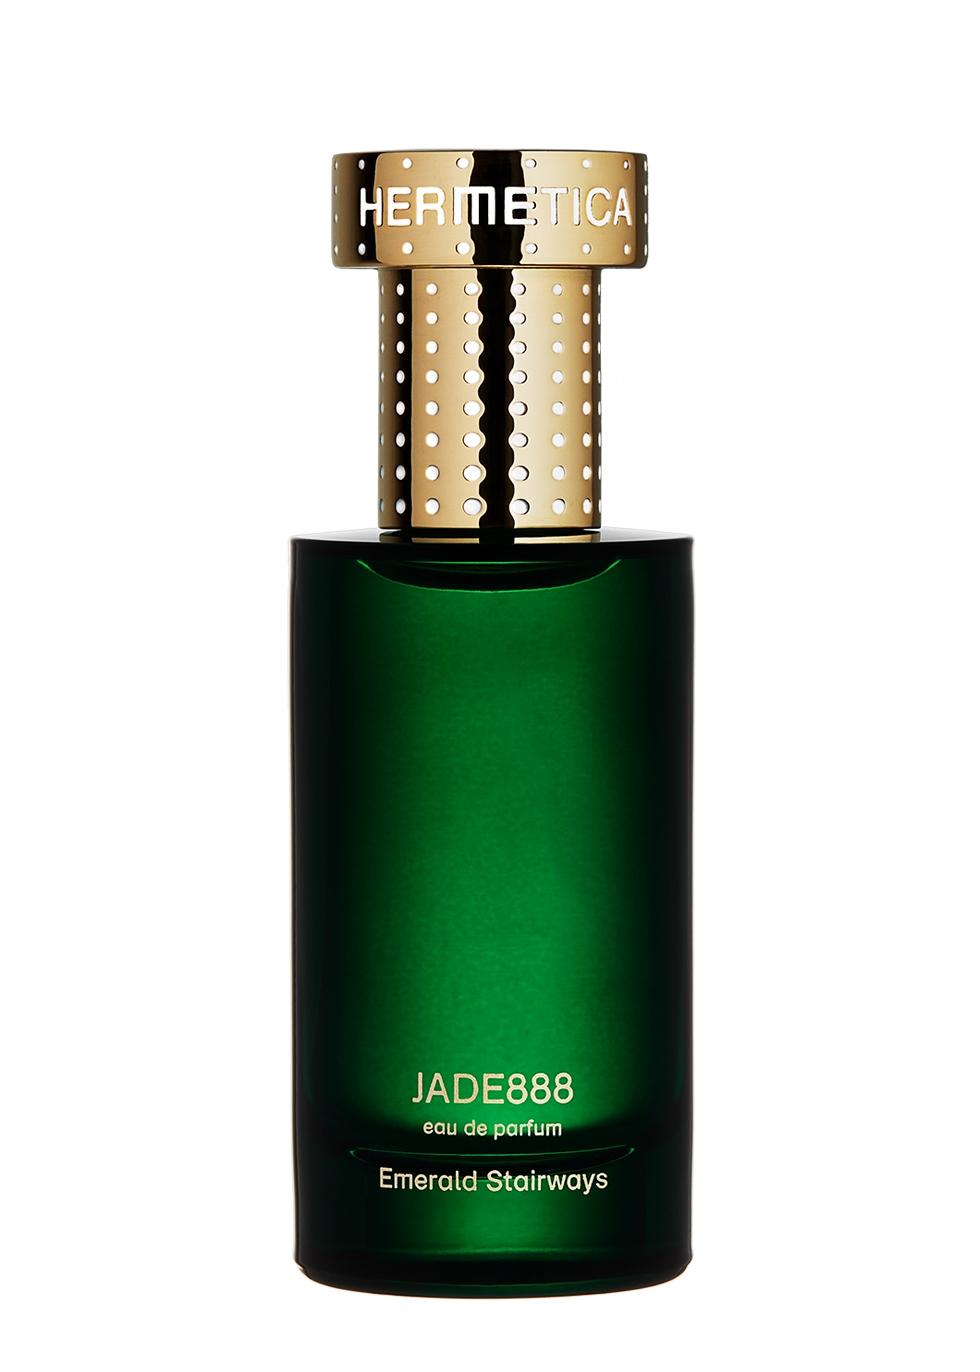 Jade888 Eau De Parfum 50ml - HERMETICA